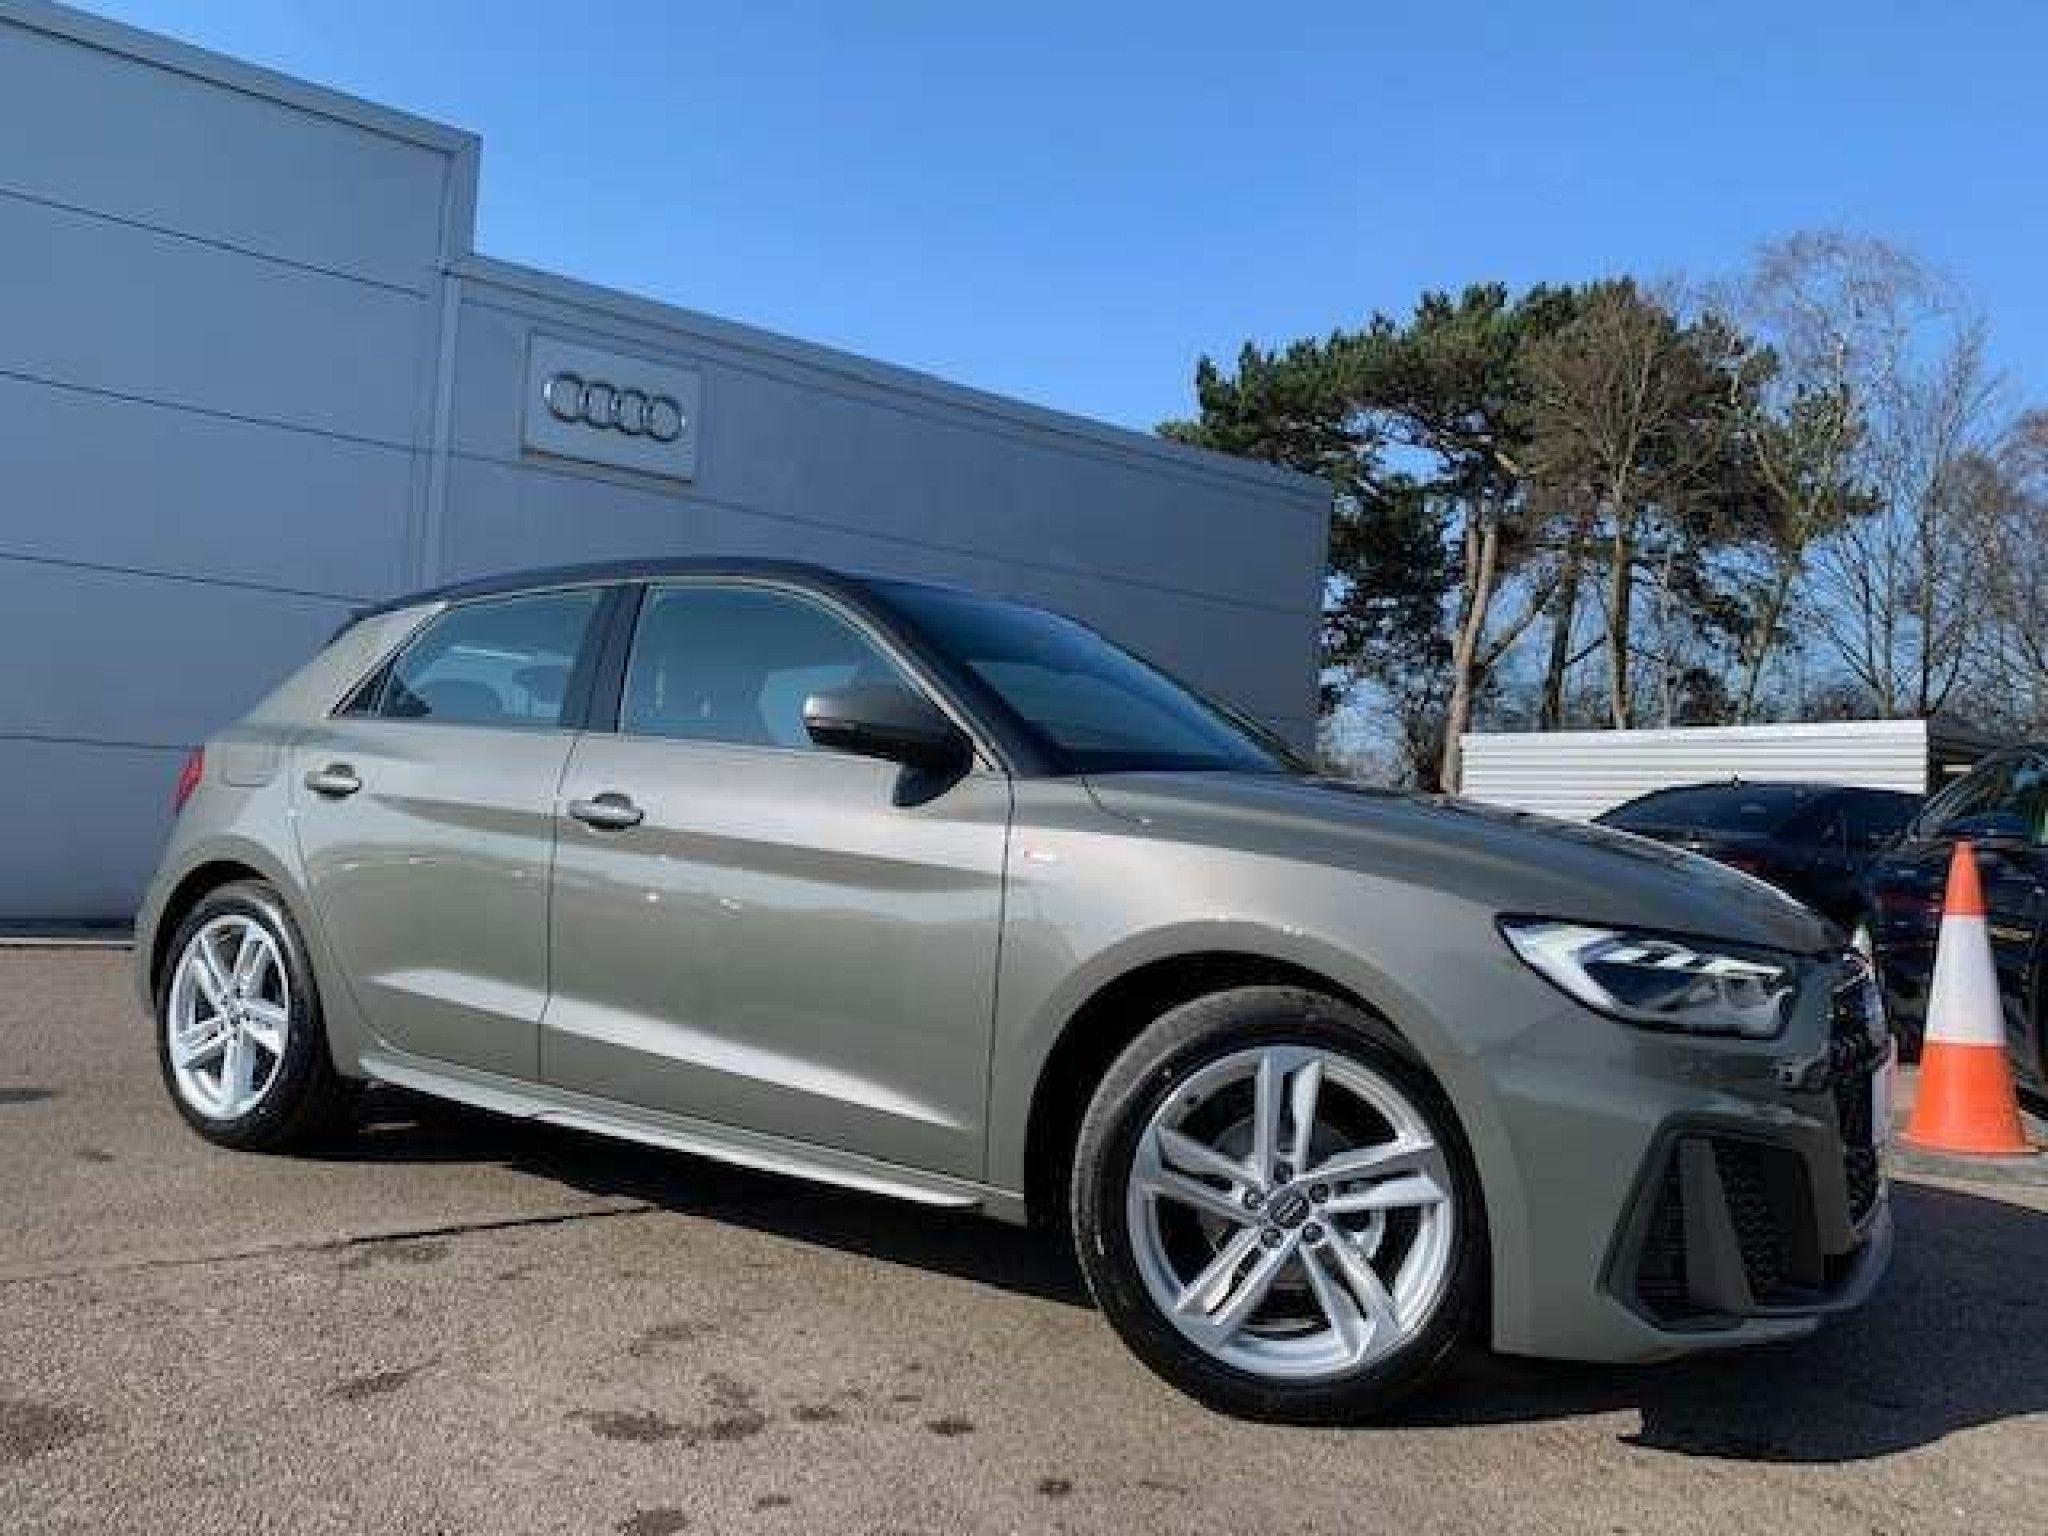 Audi A1 1 0 Tfsi 25 S Line Sportback S S 5dr In 2020 Audi A1